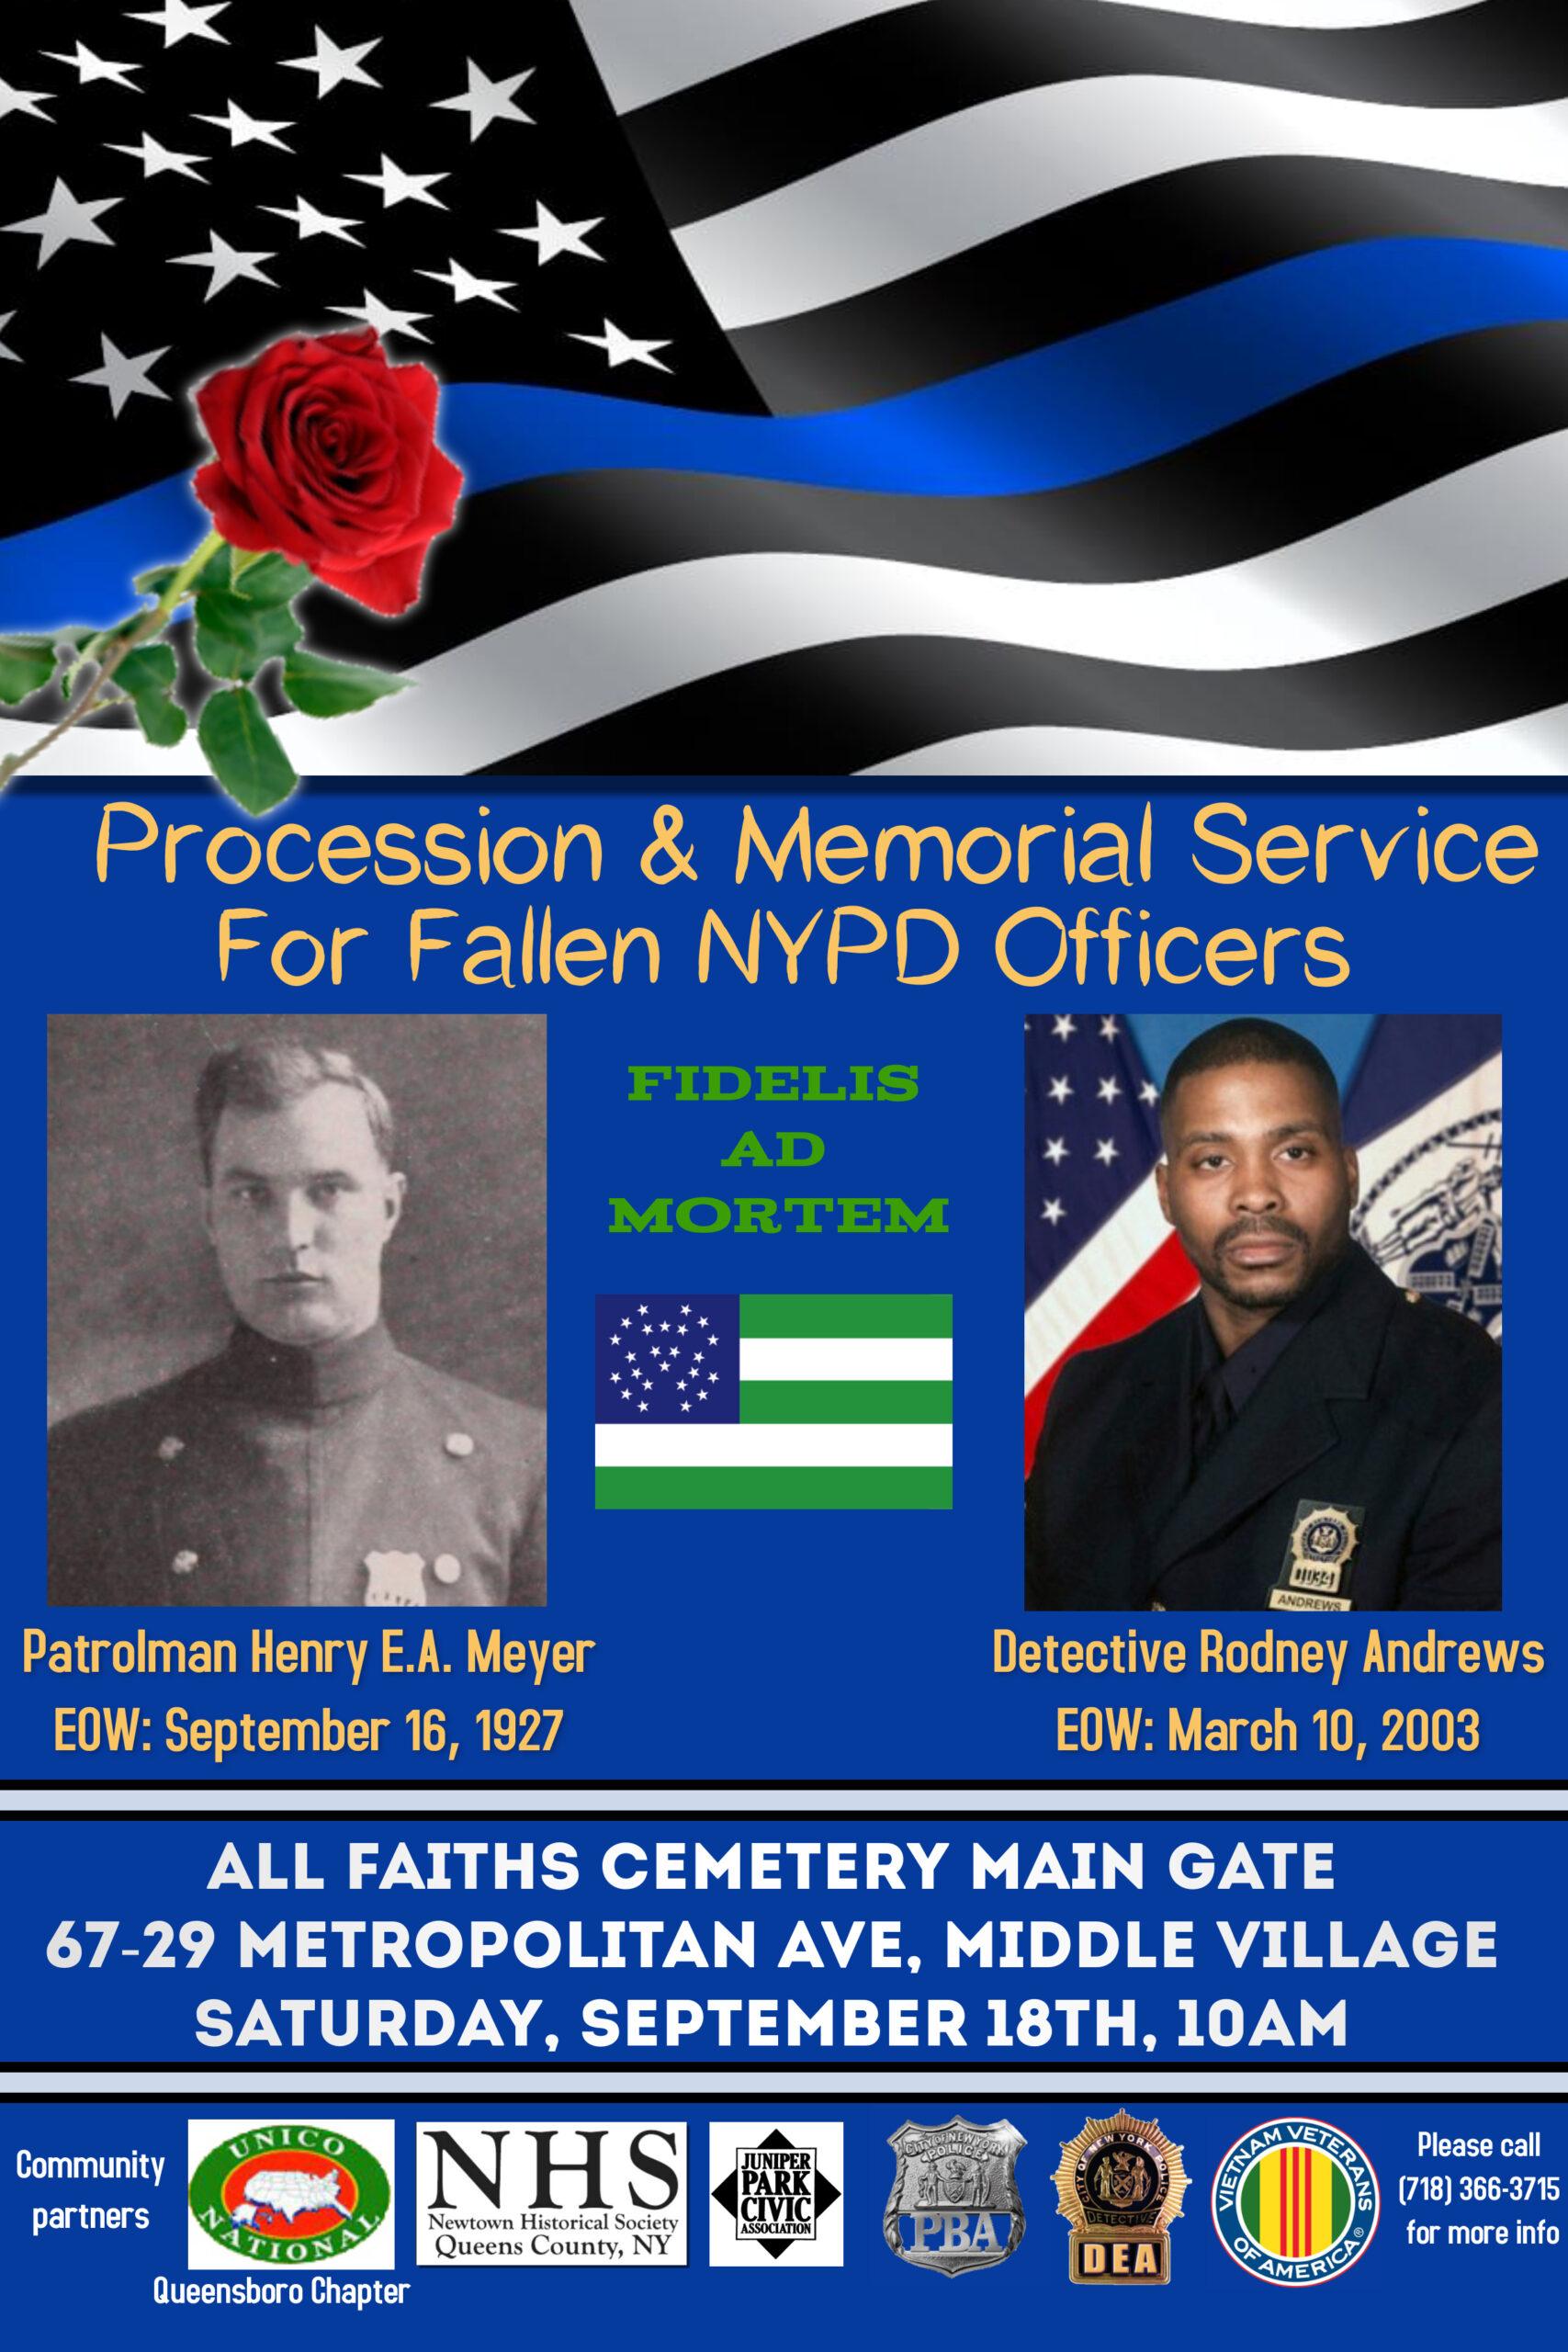 Annual police memorial event 9/18